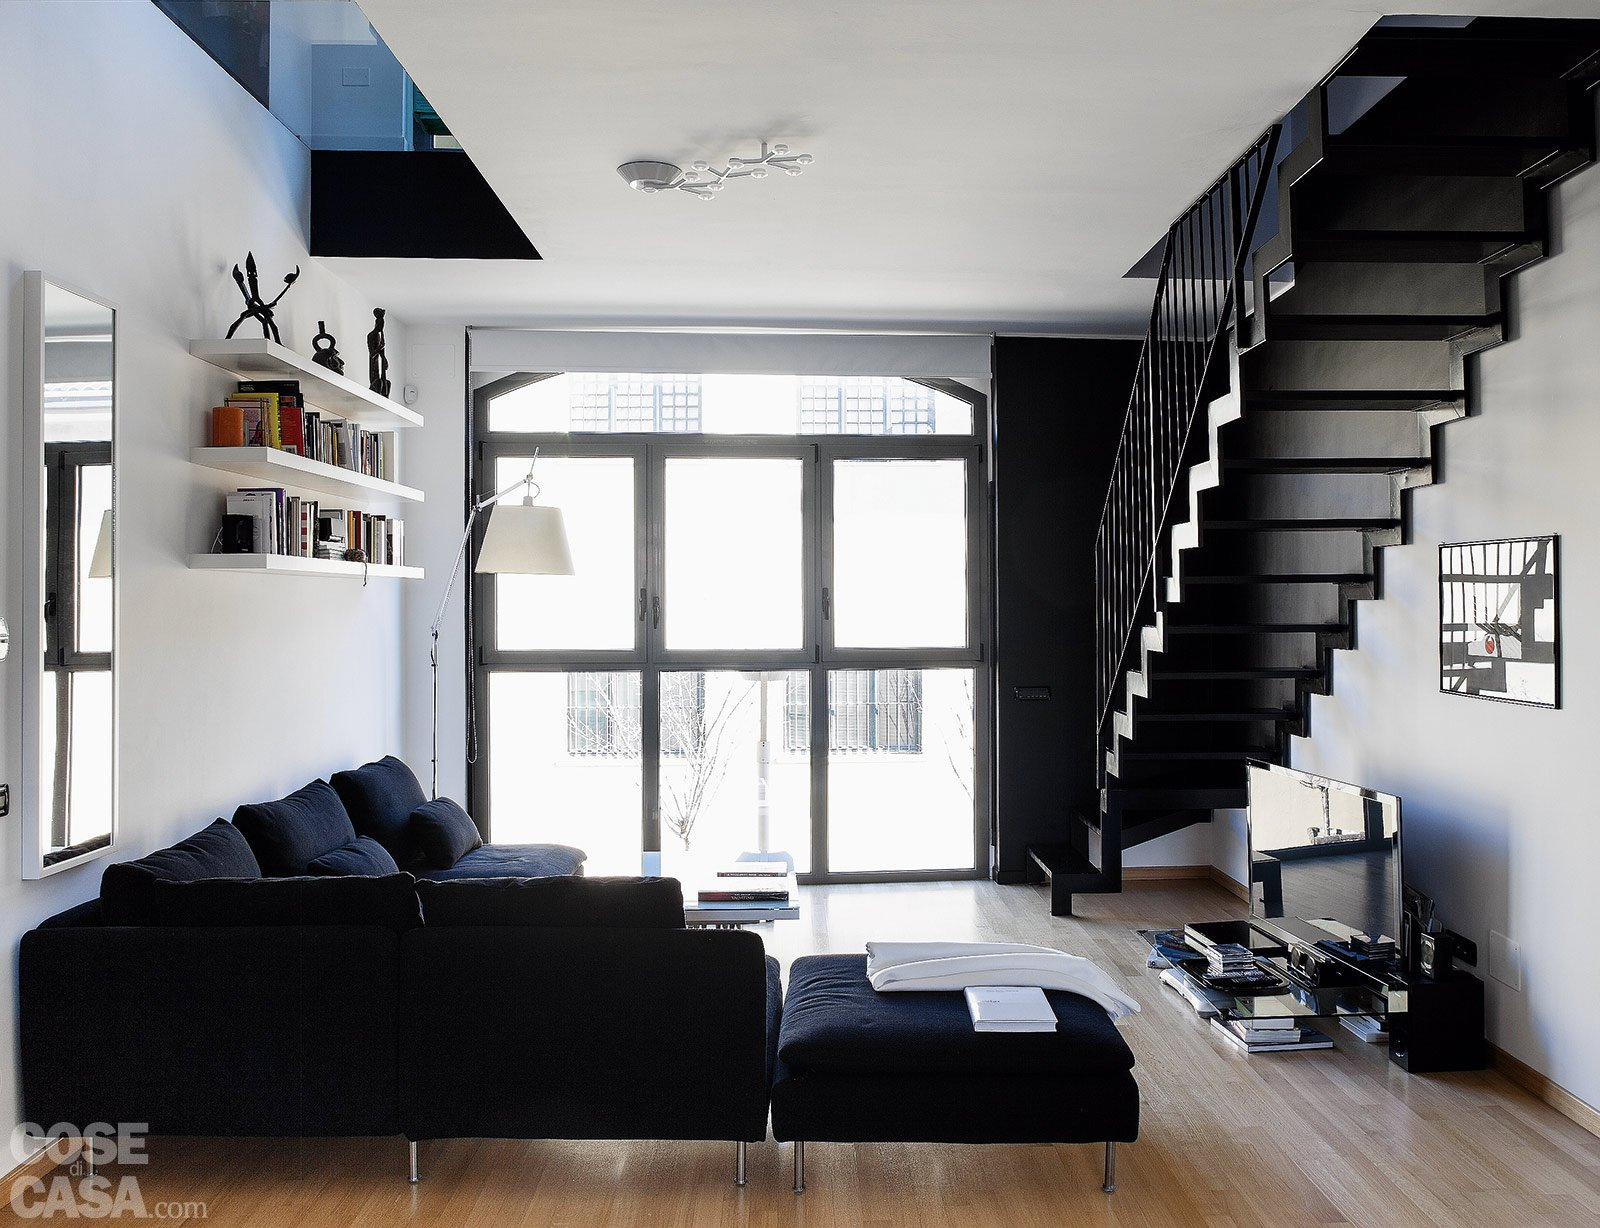 60 50 mq una casa con elementi a scomparsa cose di casa for Piani di ascensori costruiti in casa